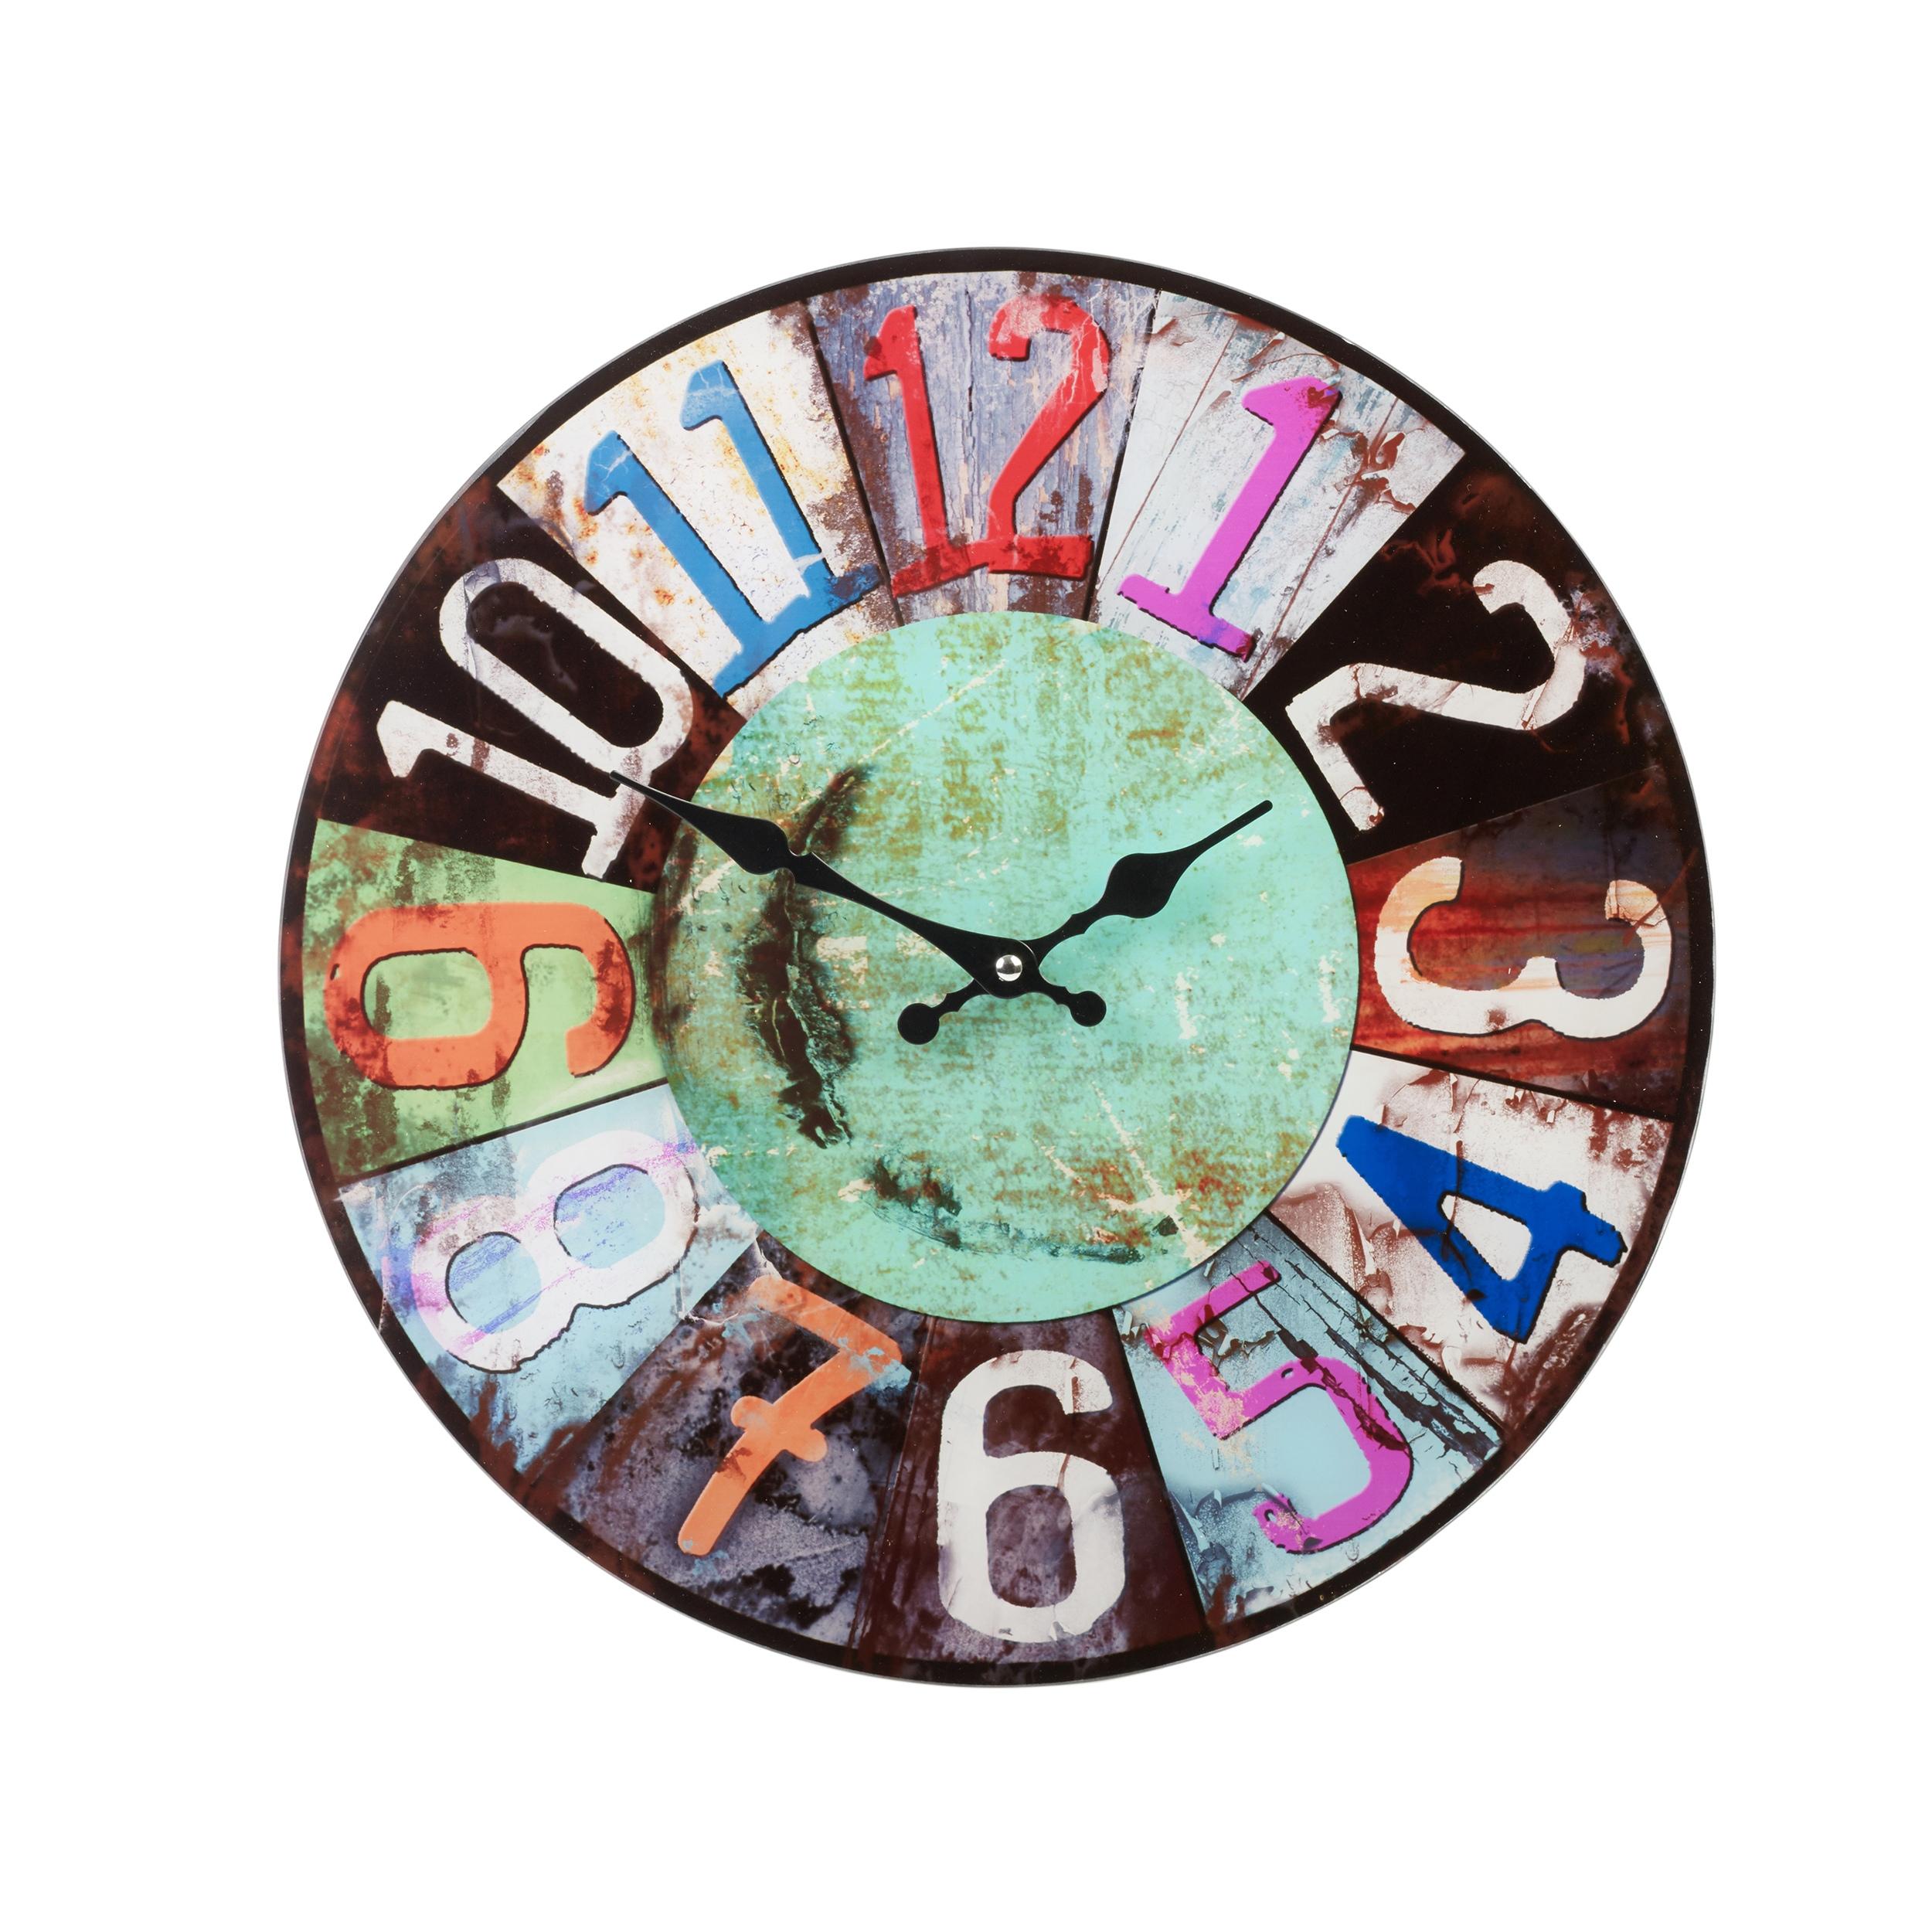 38cm Large Round Glass Shabby Wall Clock Vintage Retro ...